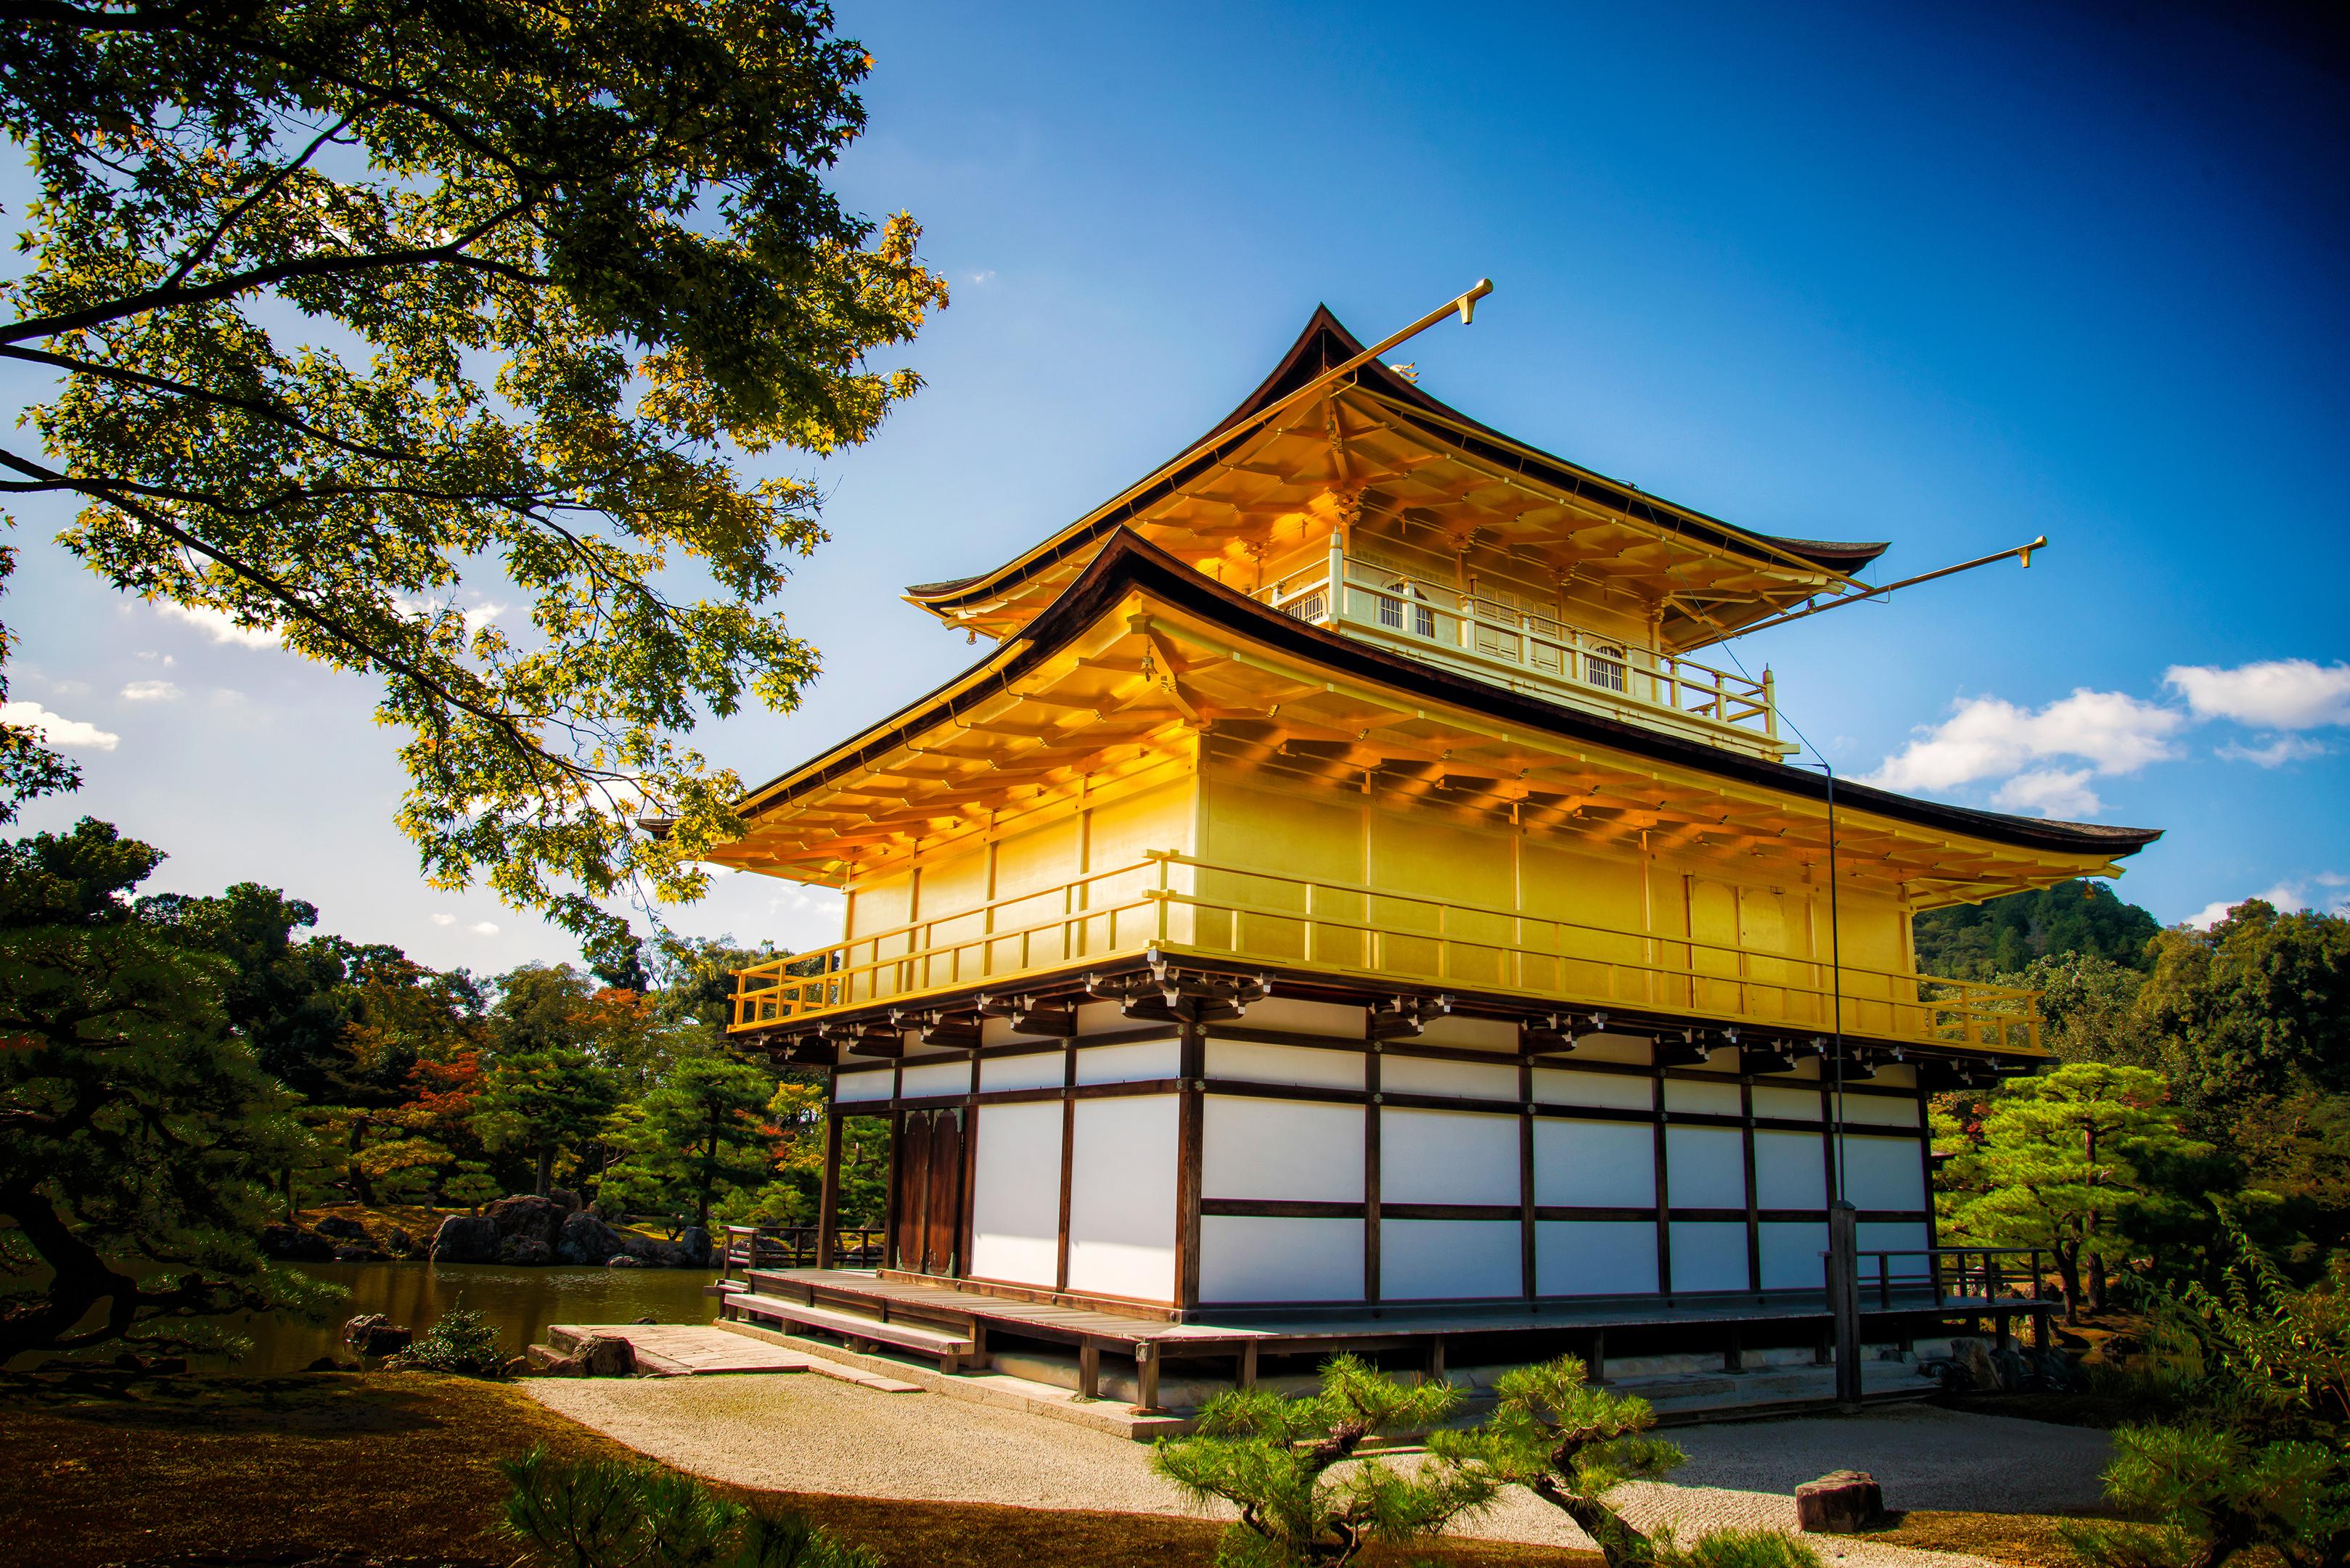 Kinkaku-ji - Kyoto's Golden Temple 2